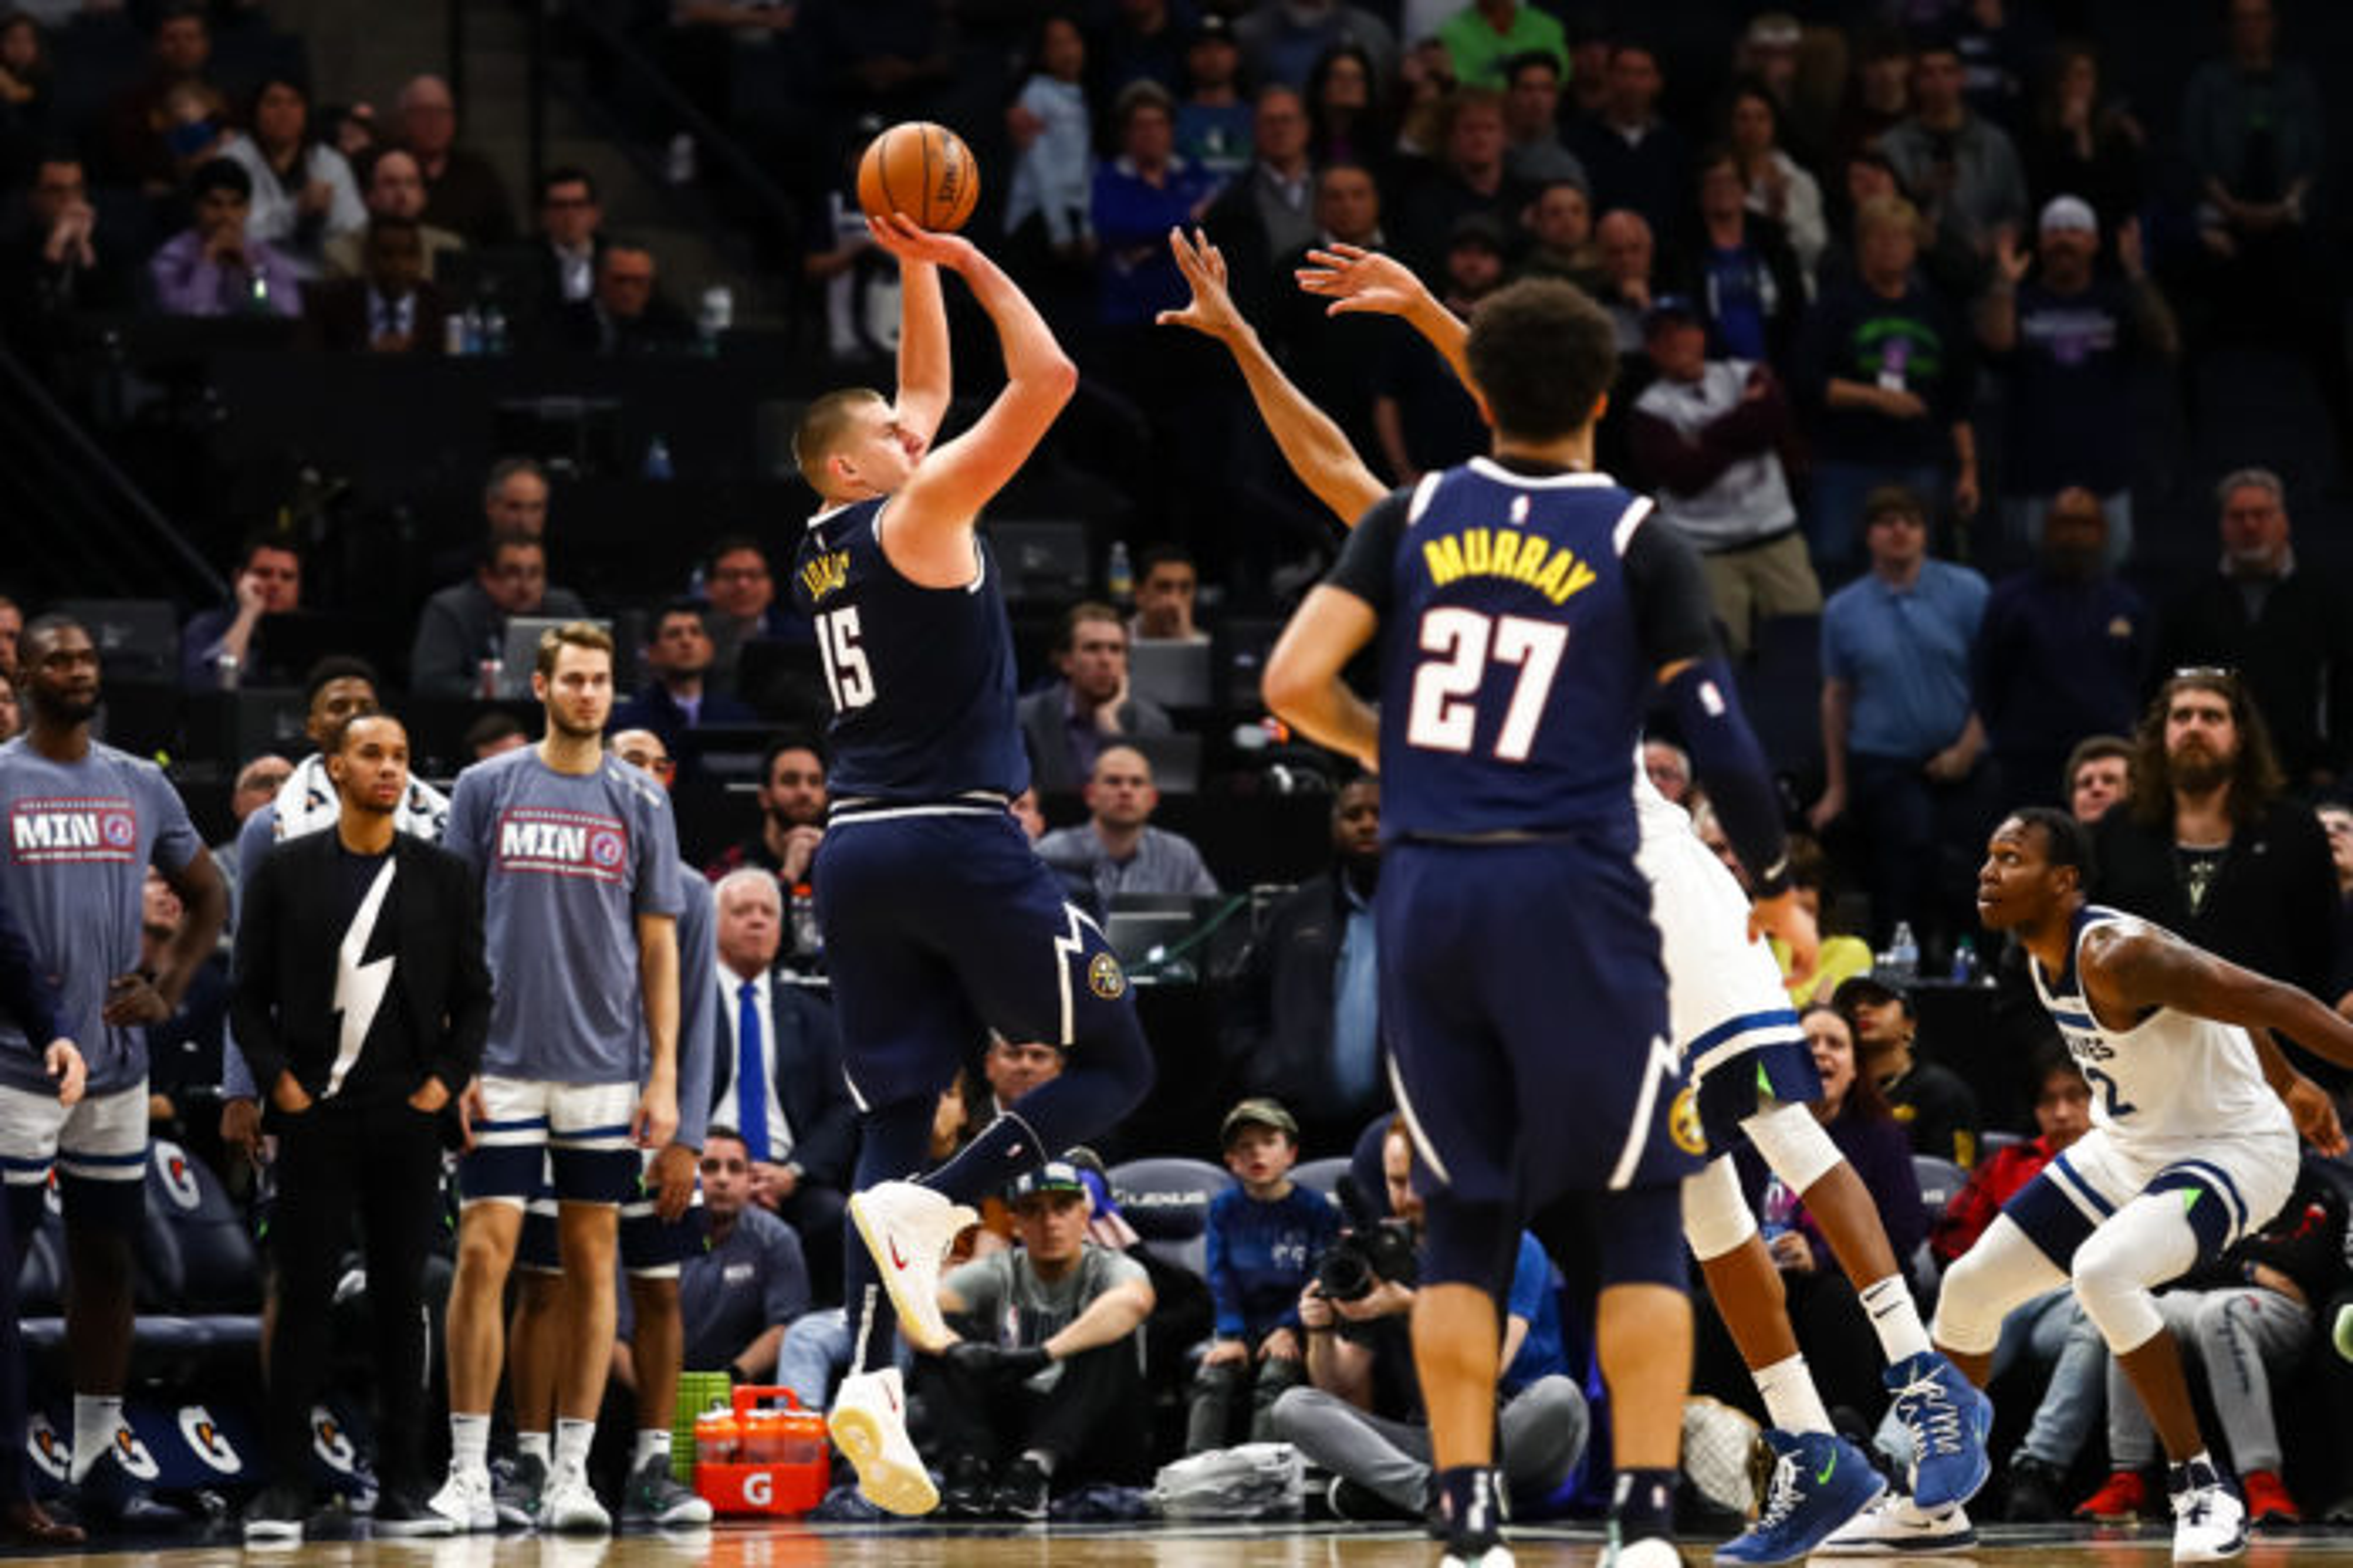 Denver Nuggets center Nikola Jokic (15) shoots the ball against the Minnesota Timberwolves during overtime at Target Center.